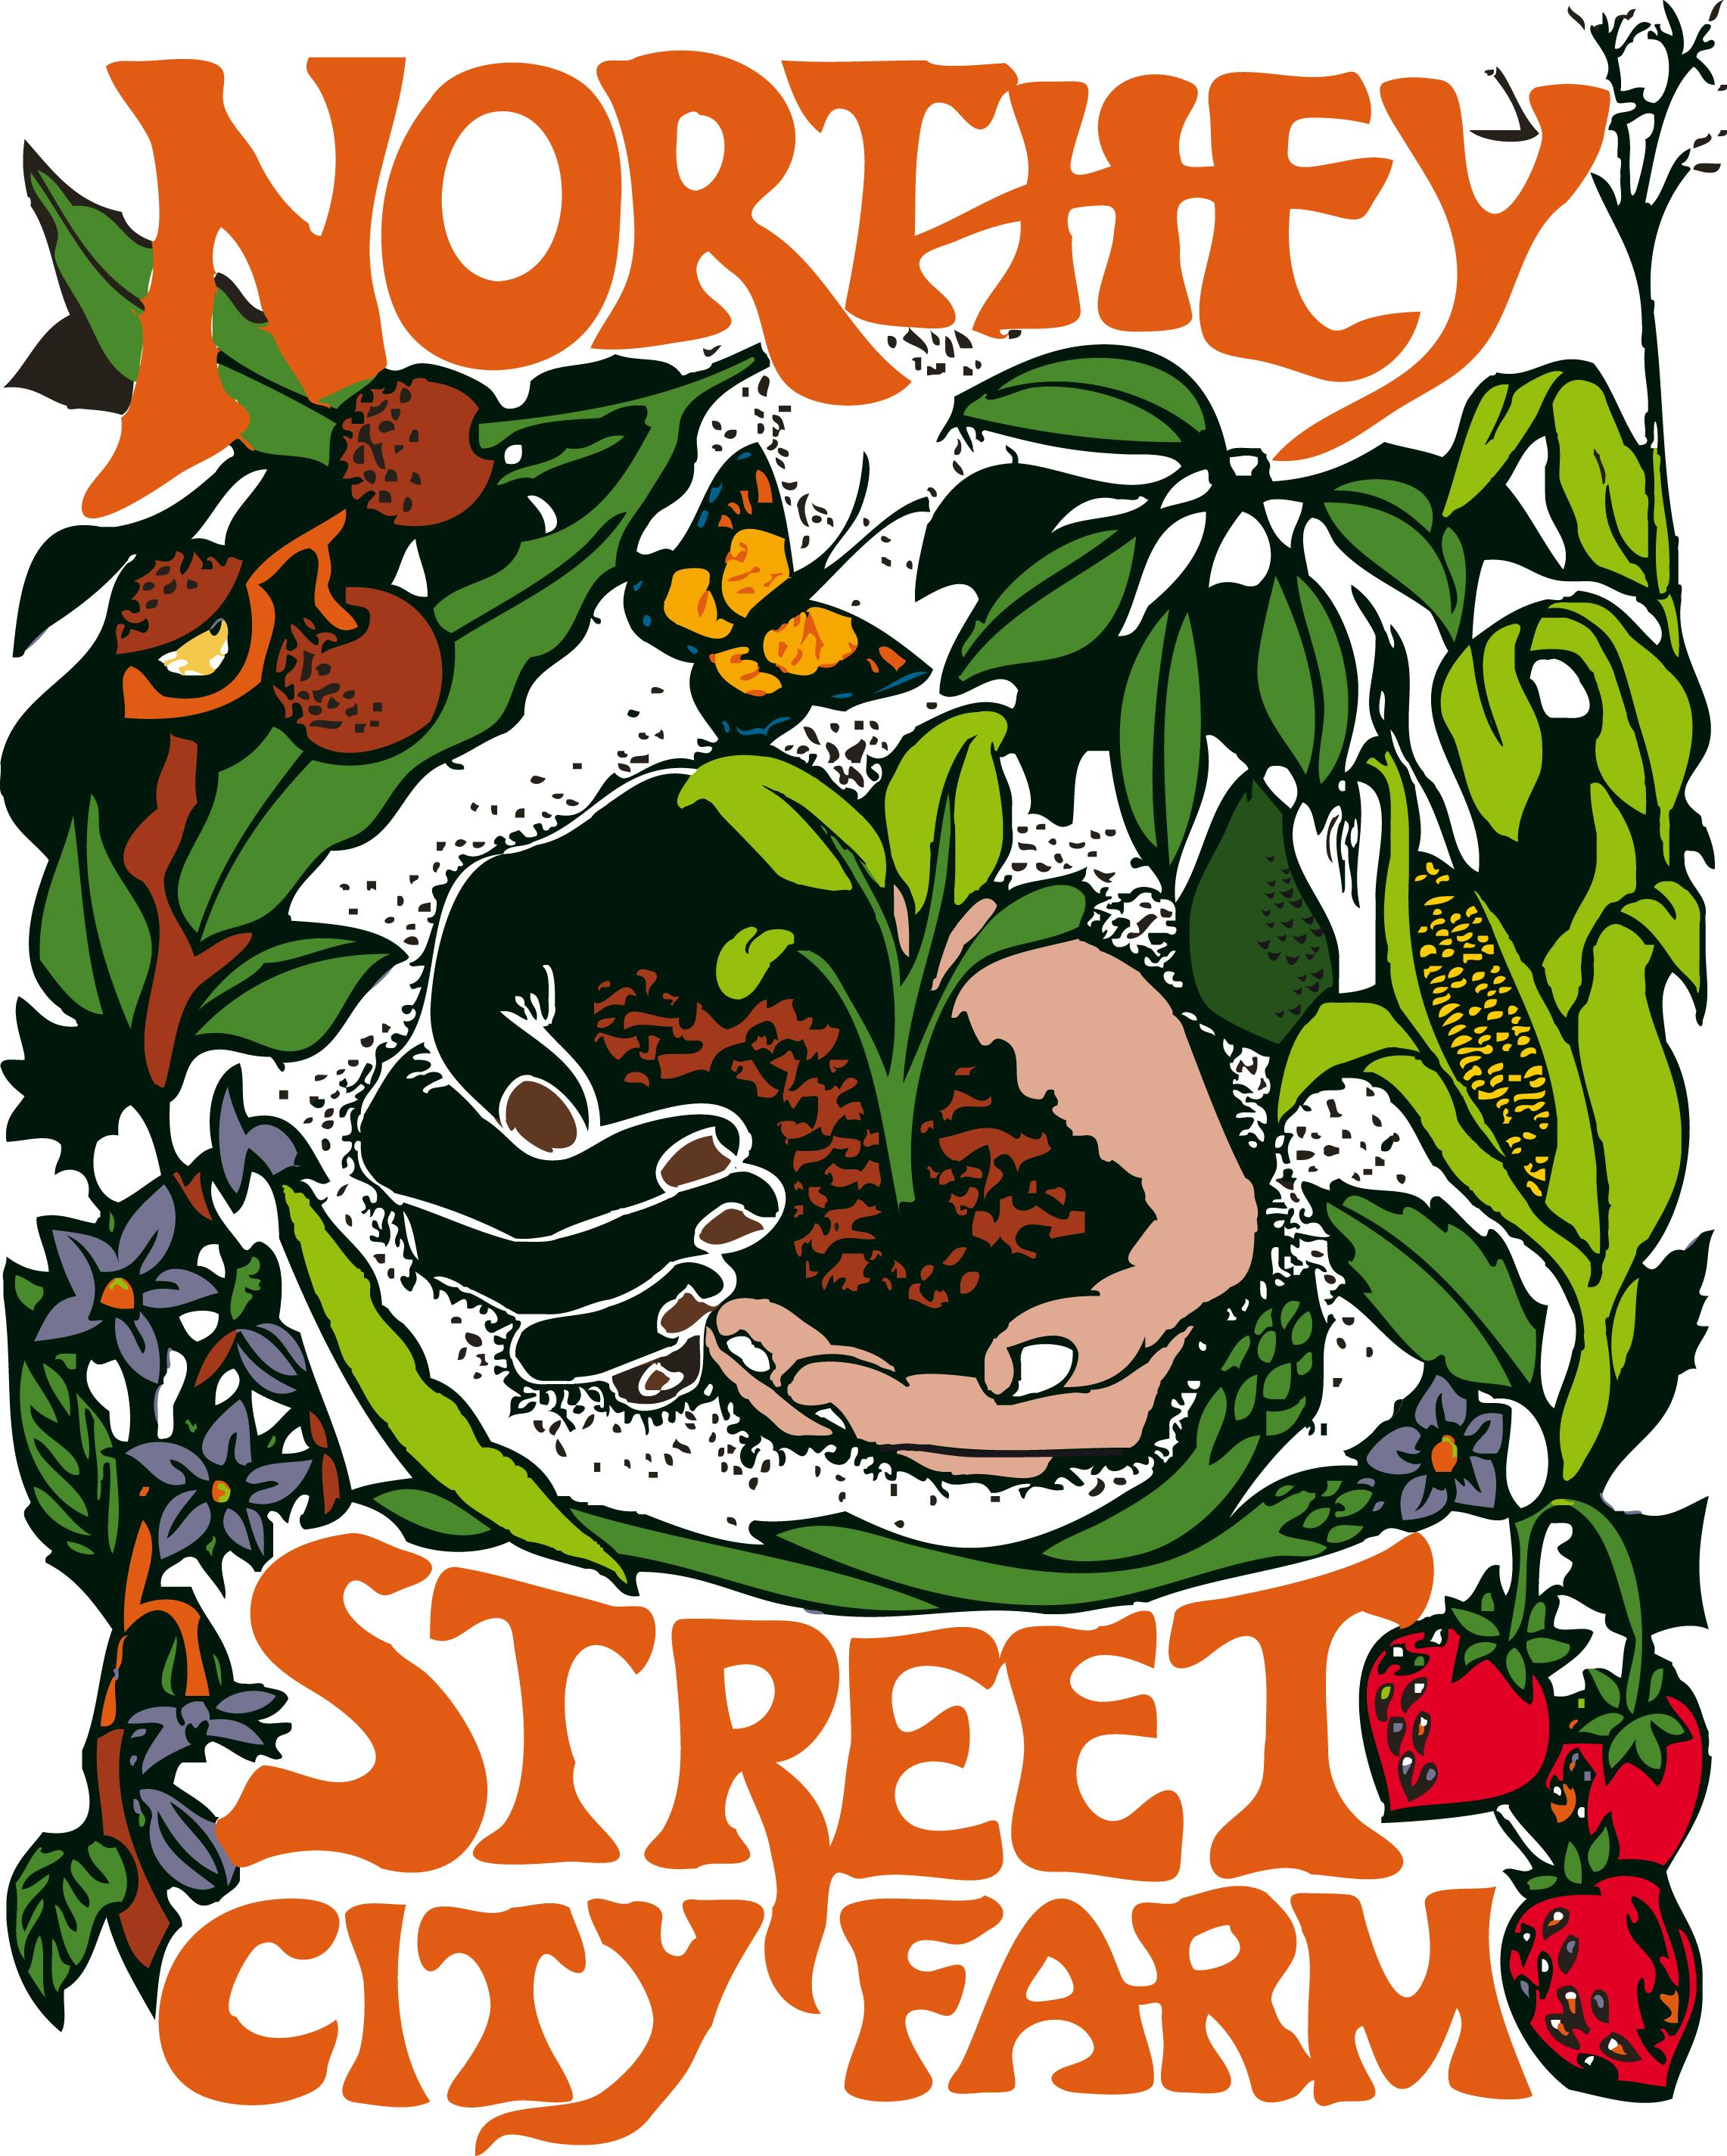 2282x2849 About Northey Street City Farm